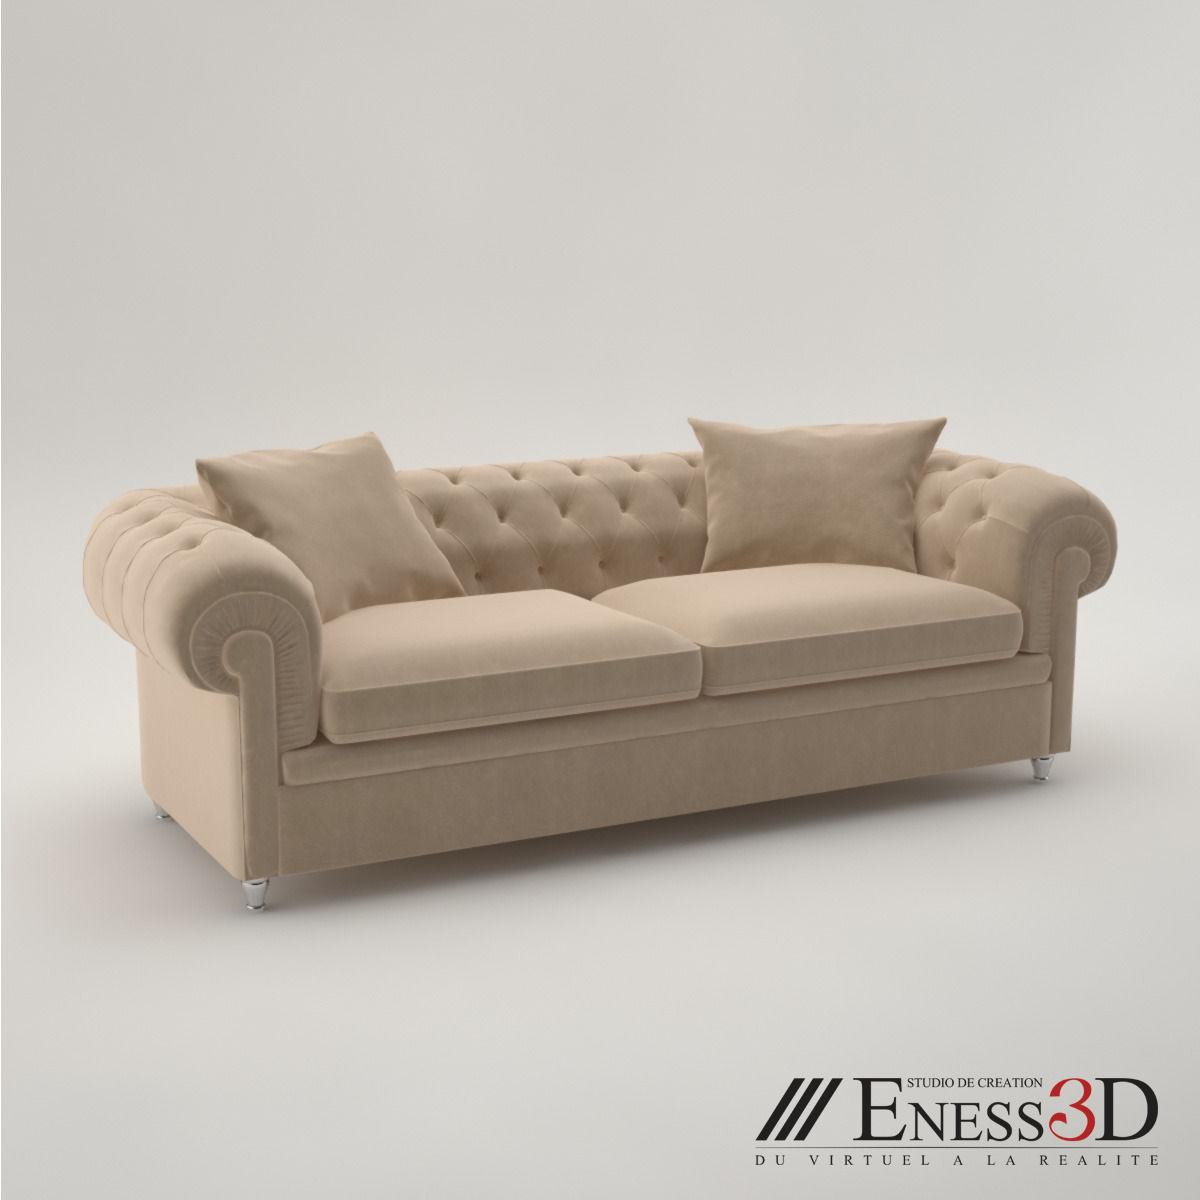 pro - fendi albione sofa 3d model max obj fbx - Fendi Sofa